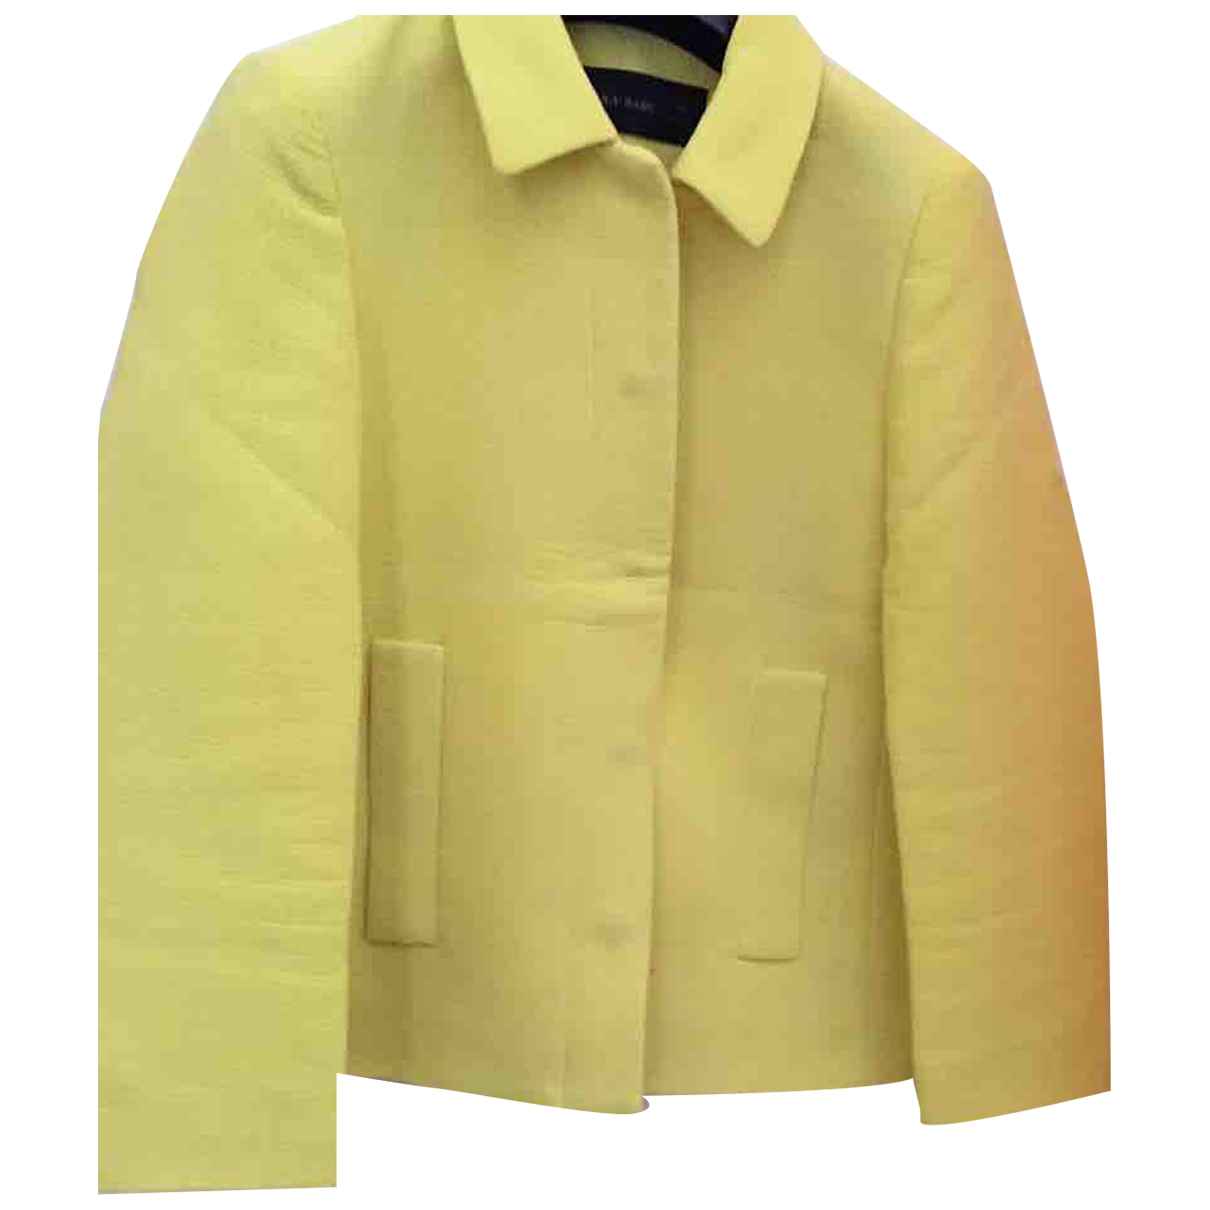 Zara \N Jacke in  Gelb Polyester